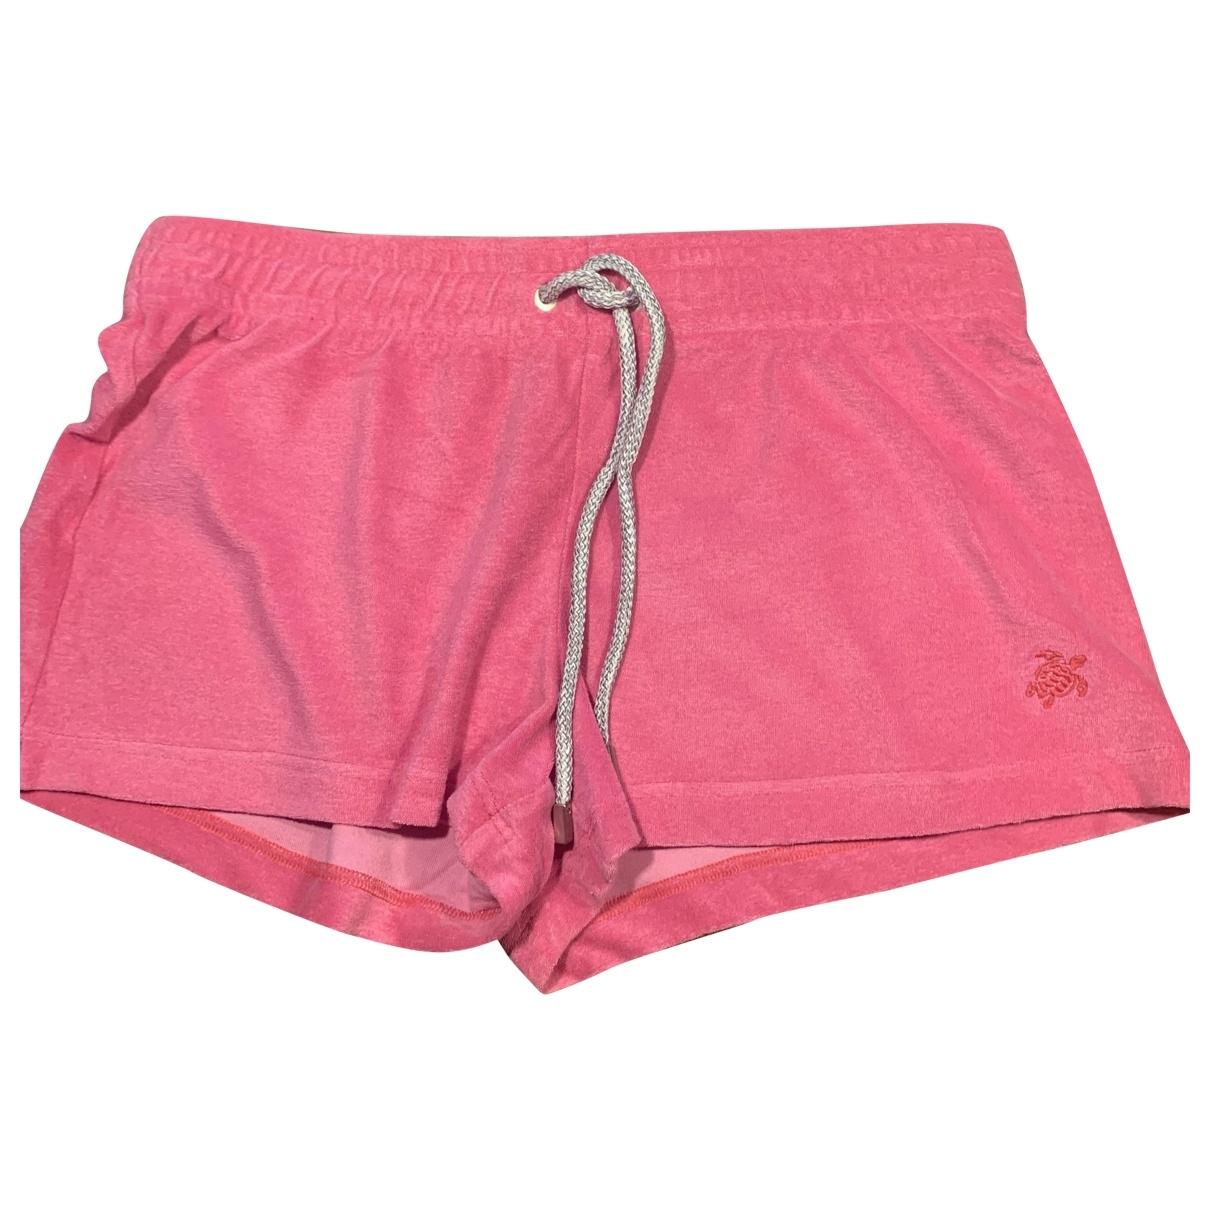 Vilebrequin - Bain   pour femme en eponge - rose